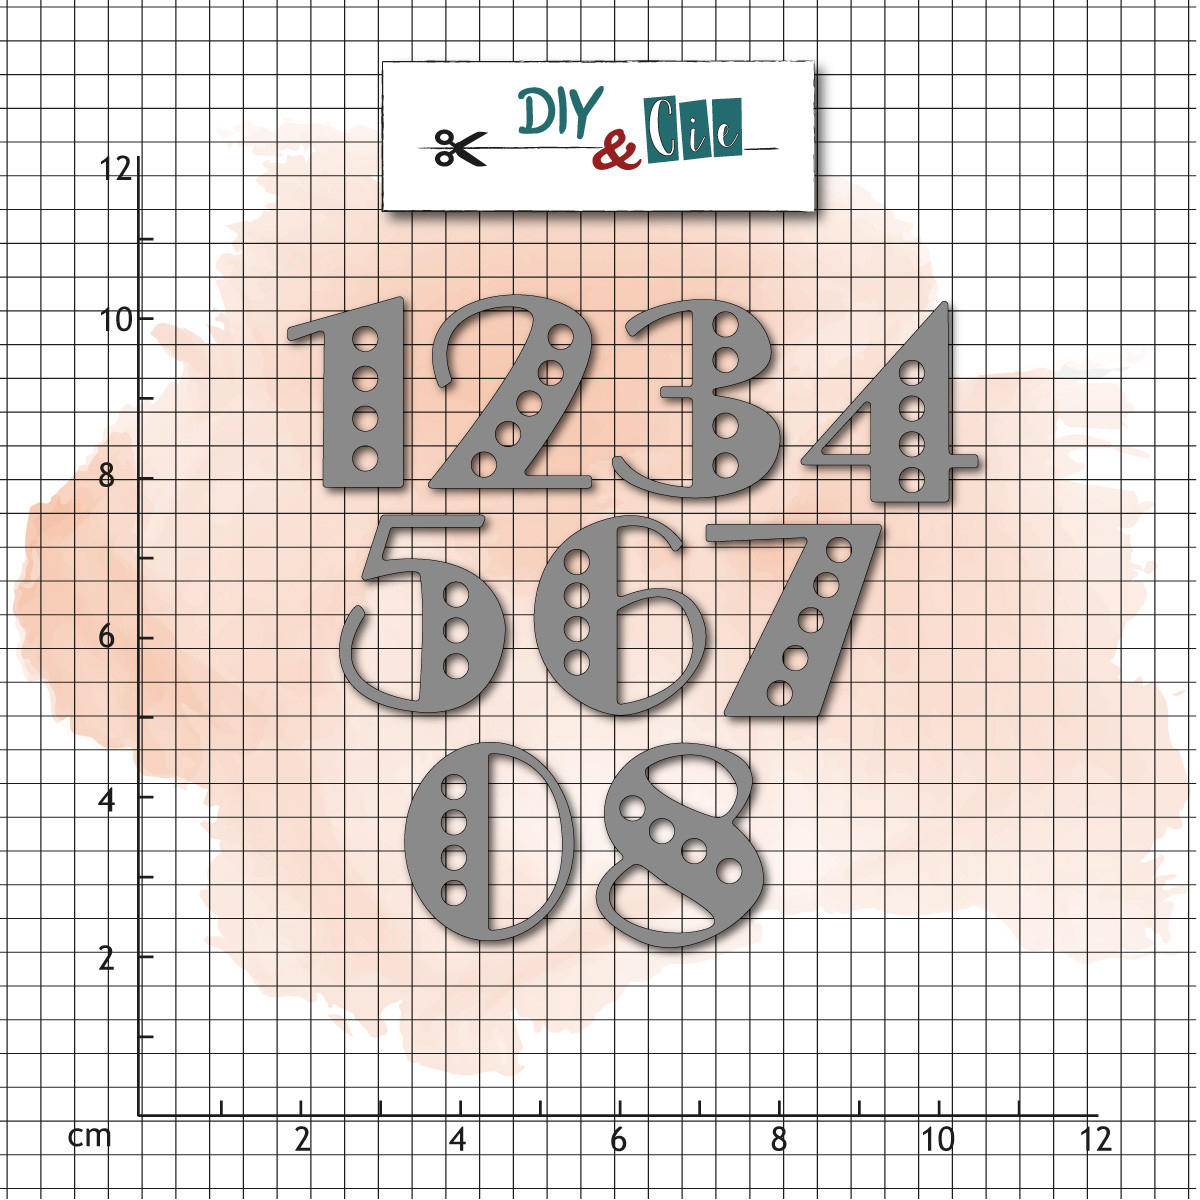 9 Dies / Matrices De Découpe 'diy & Cie - So Chic' Chiffres Music Hall -  Ellafee.re serapportantà Chiffre A Decouper